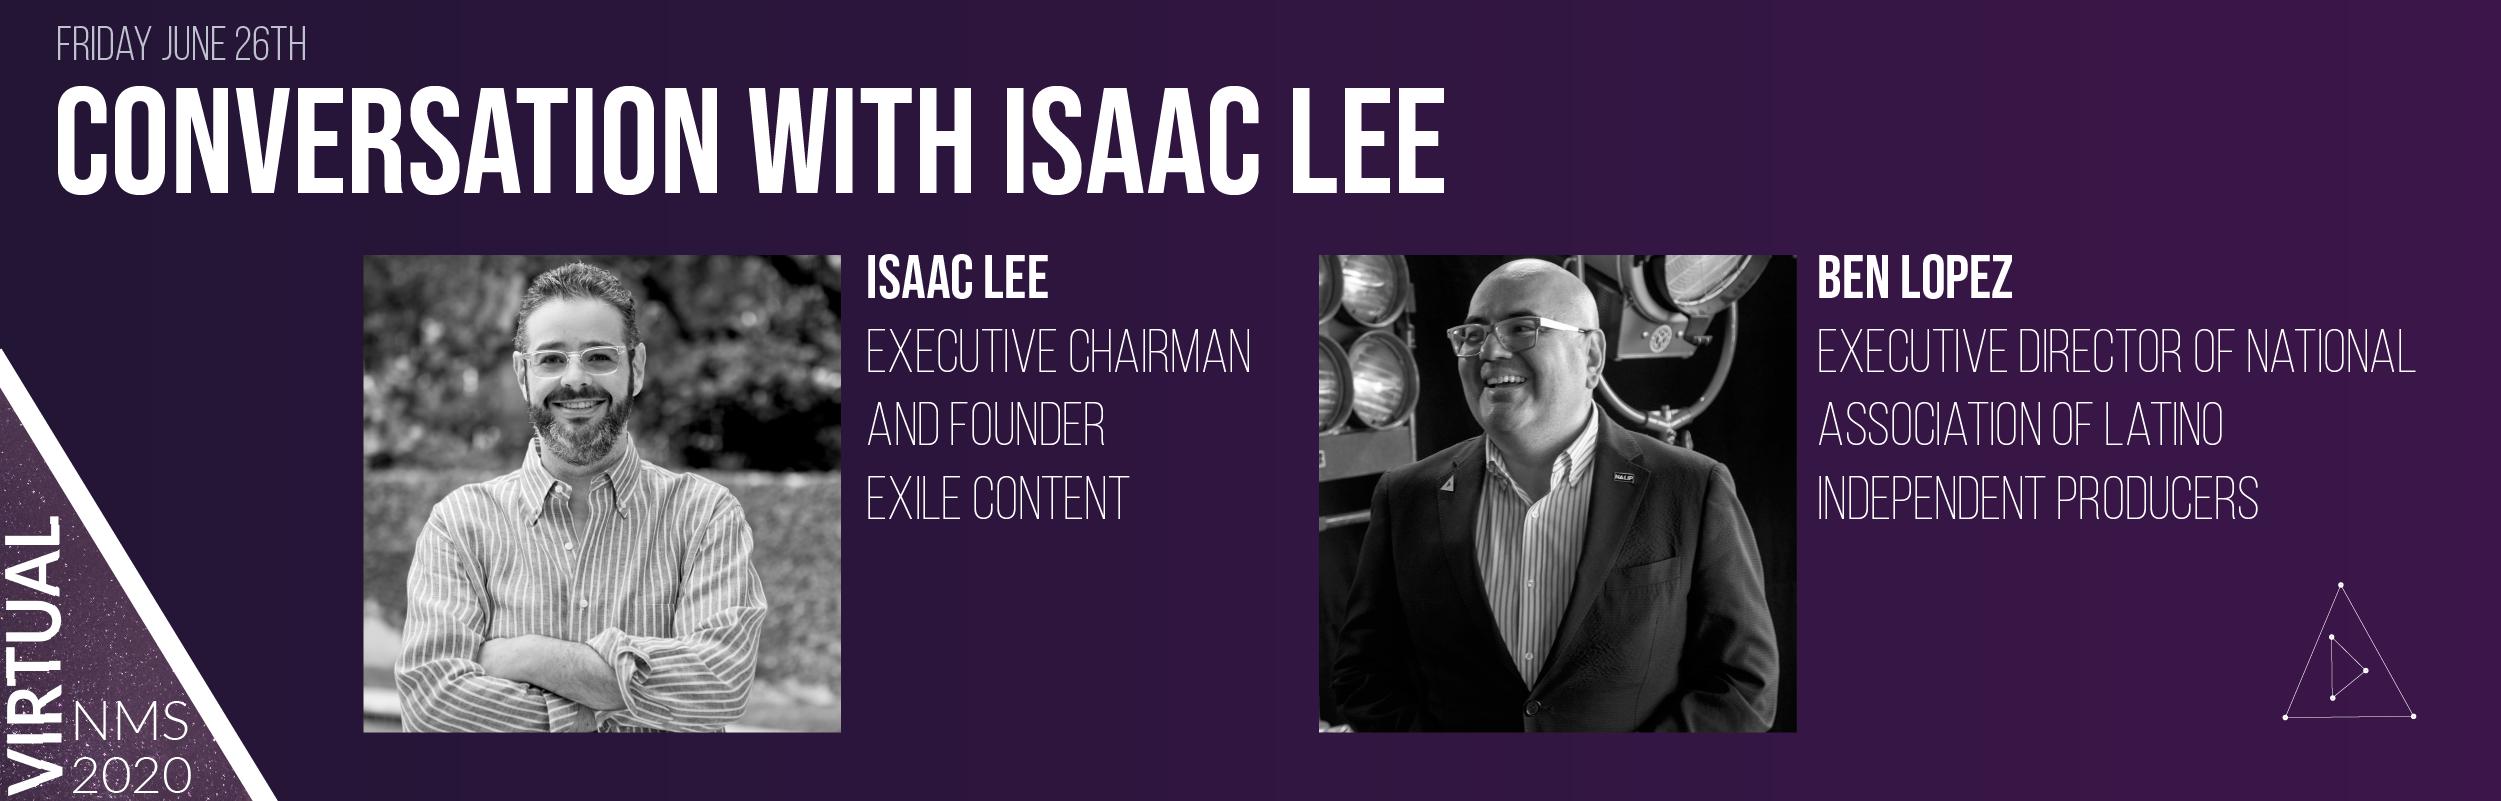 Isaac Lee Banner